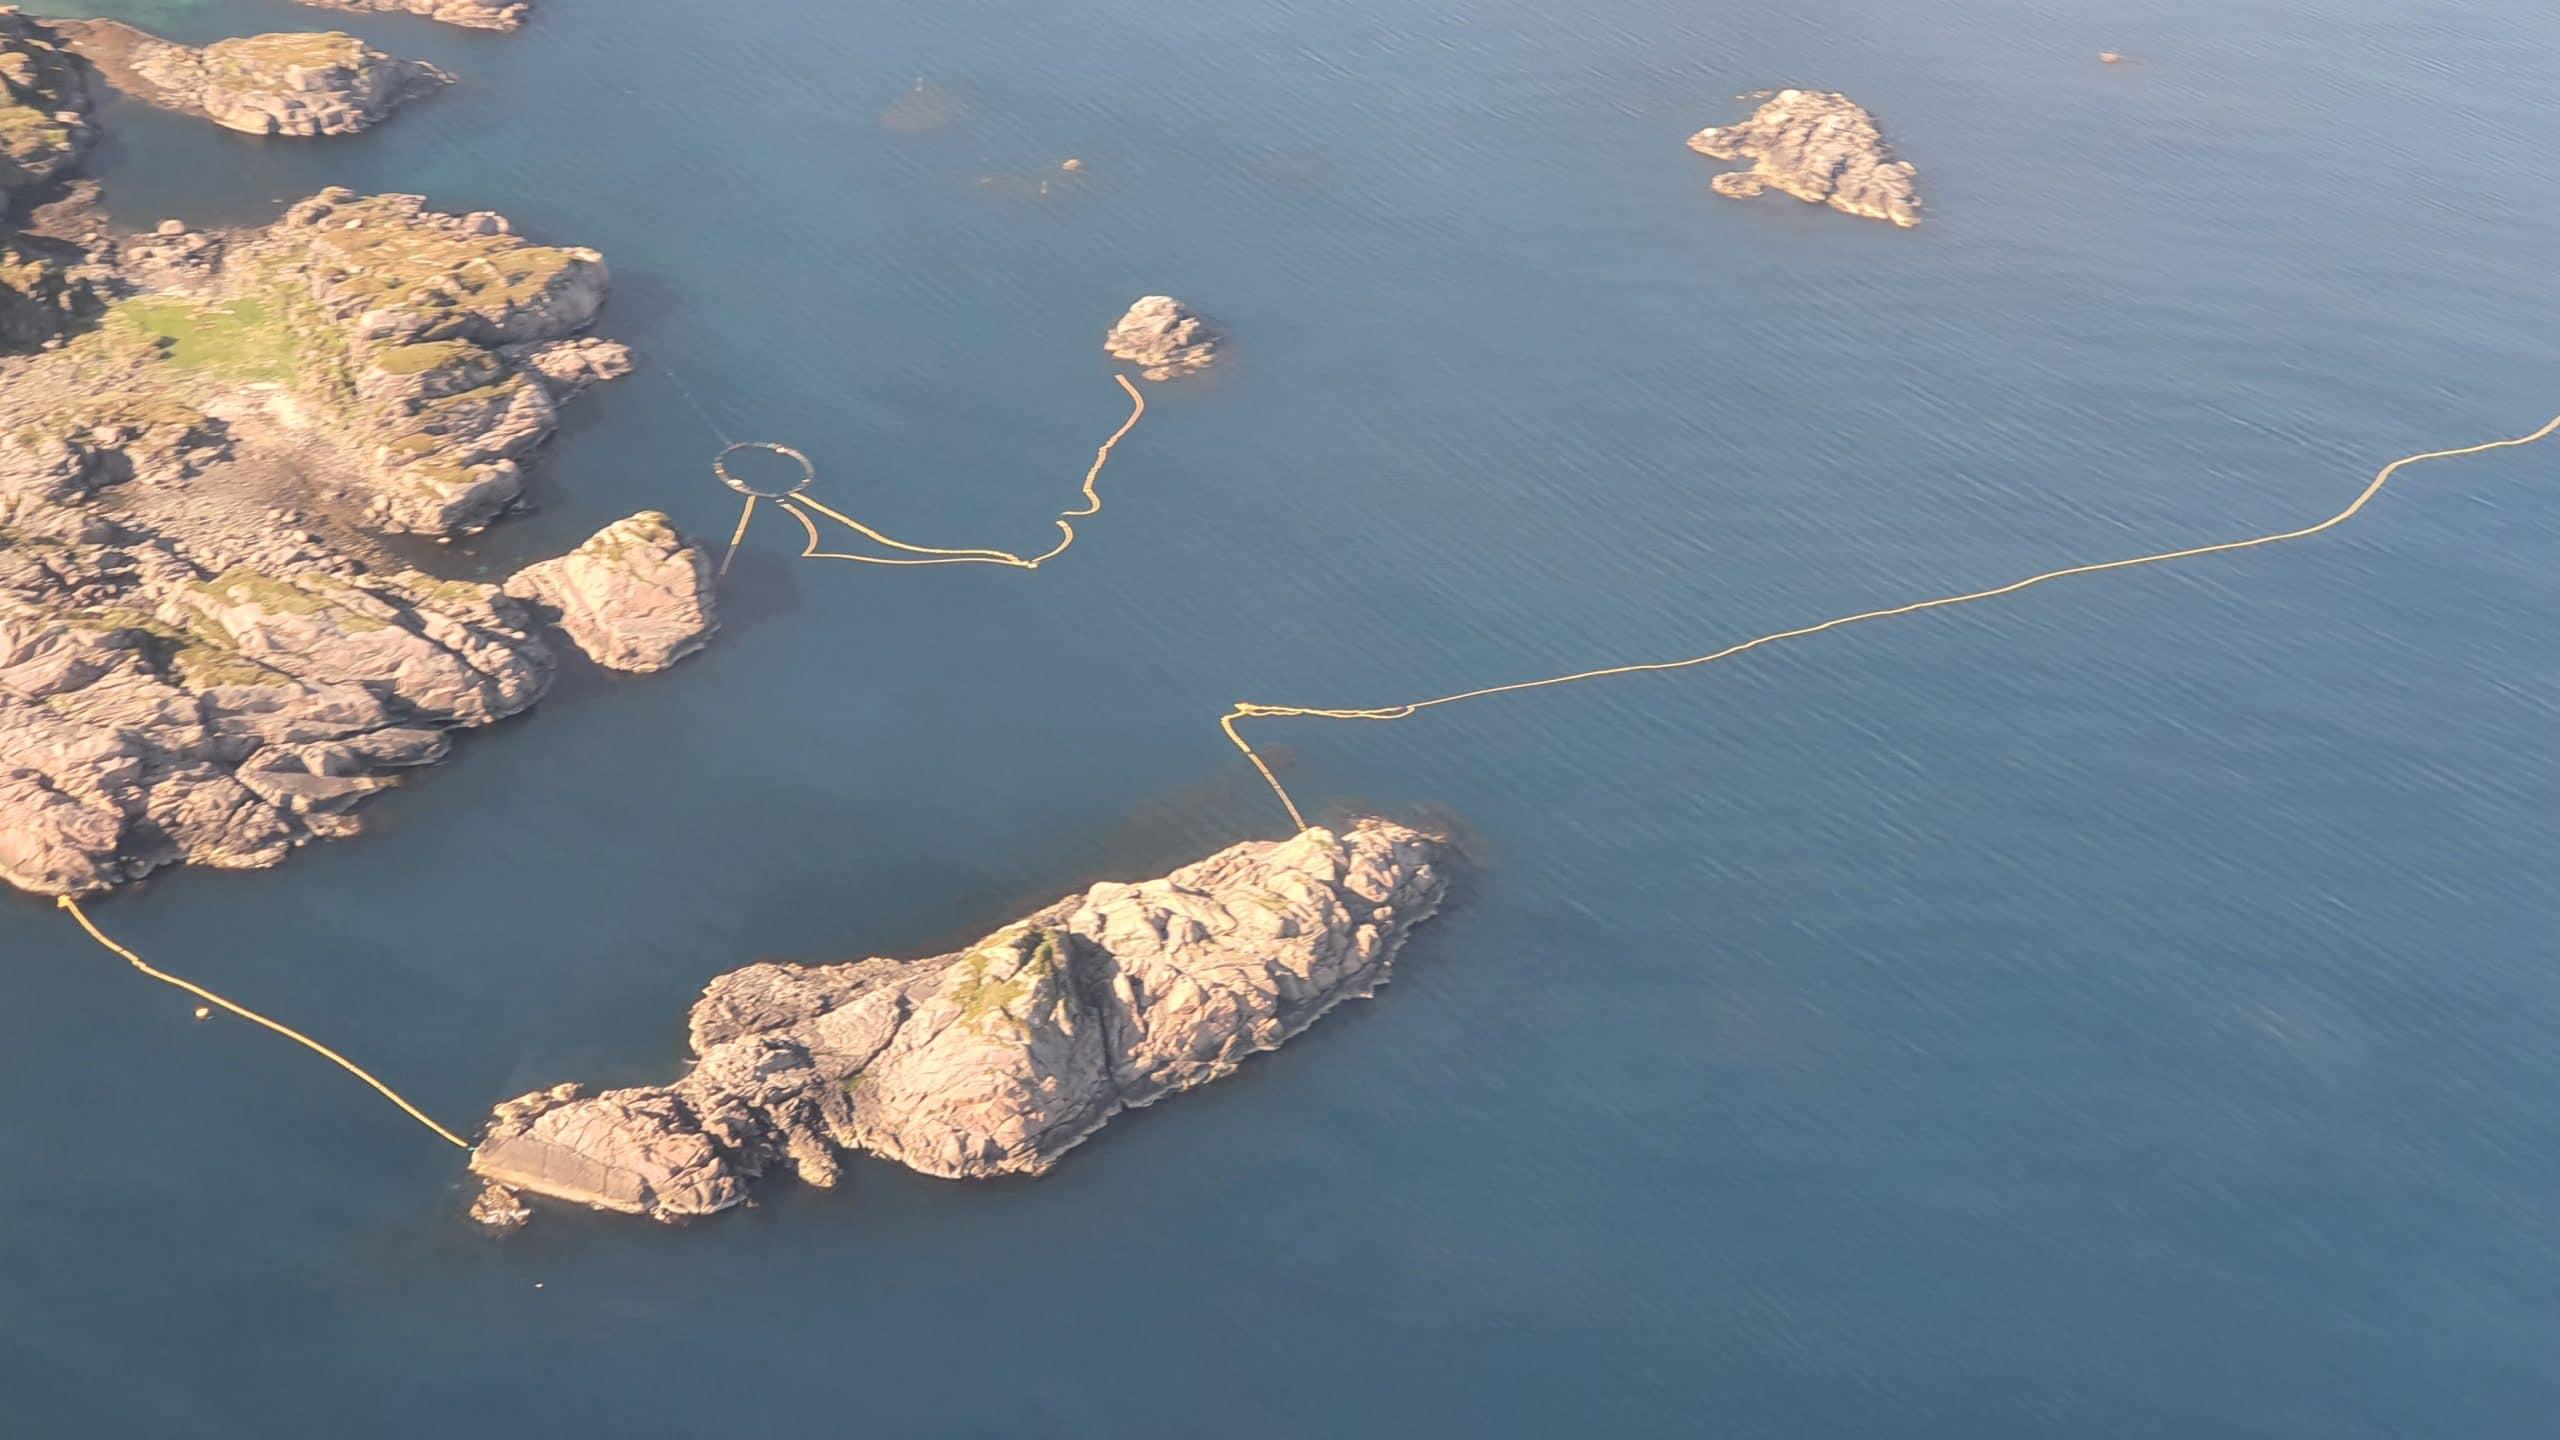 Nets set in Norway to catch minke whales